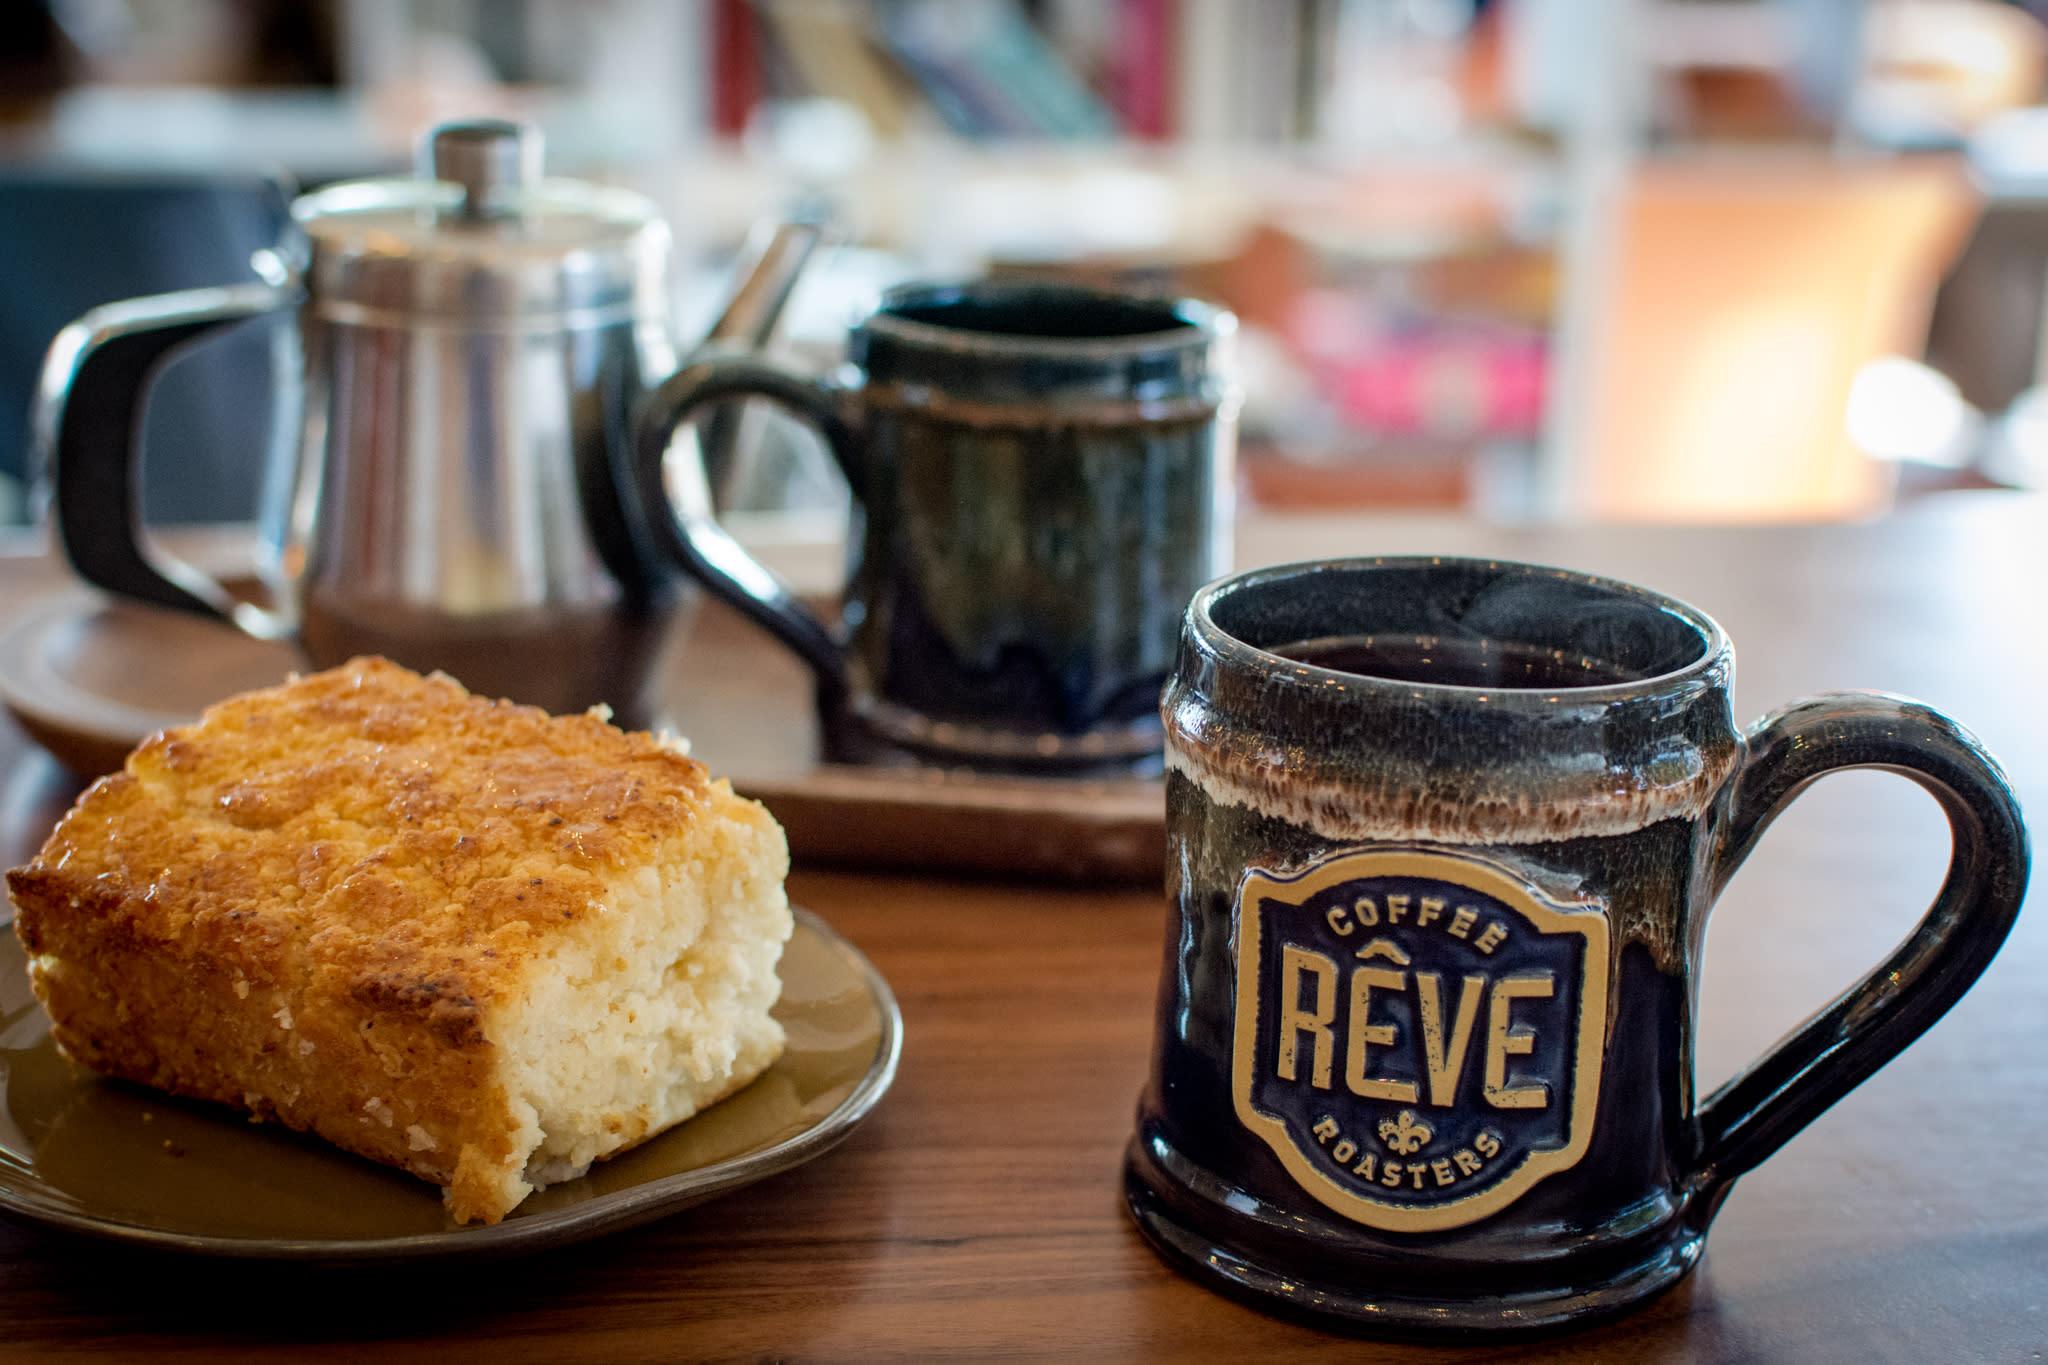 Reve Coffee and Food